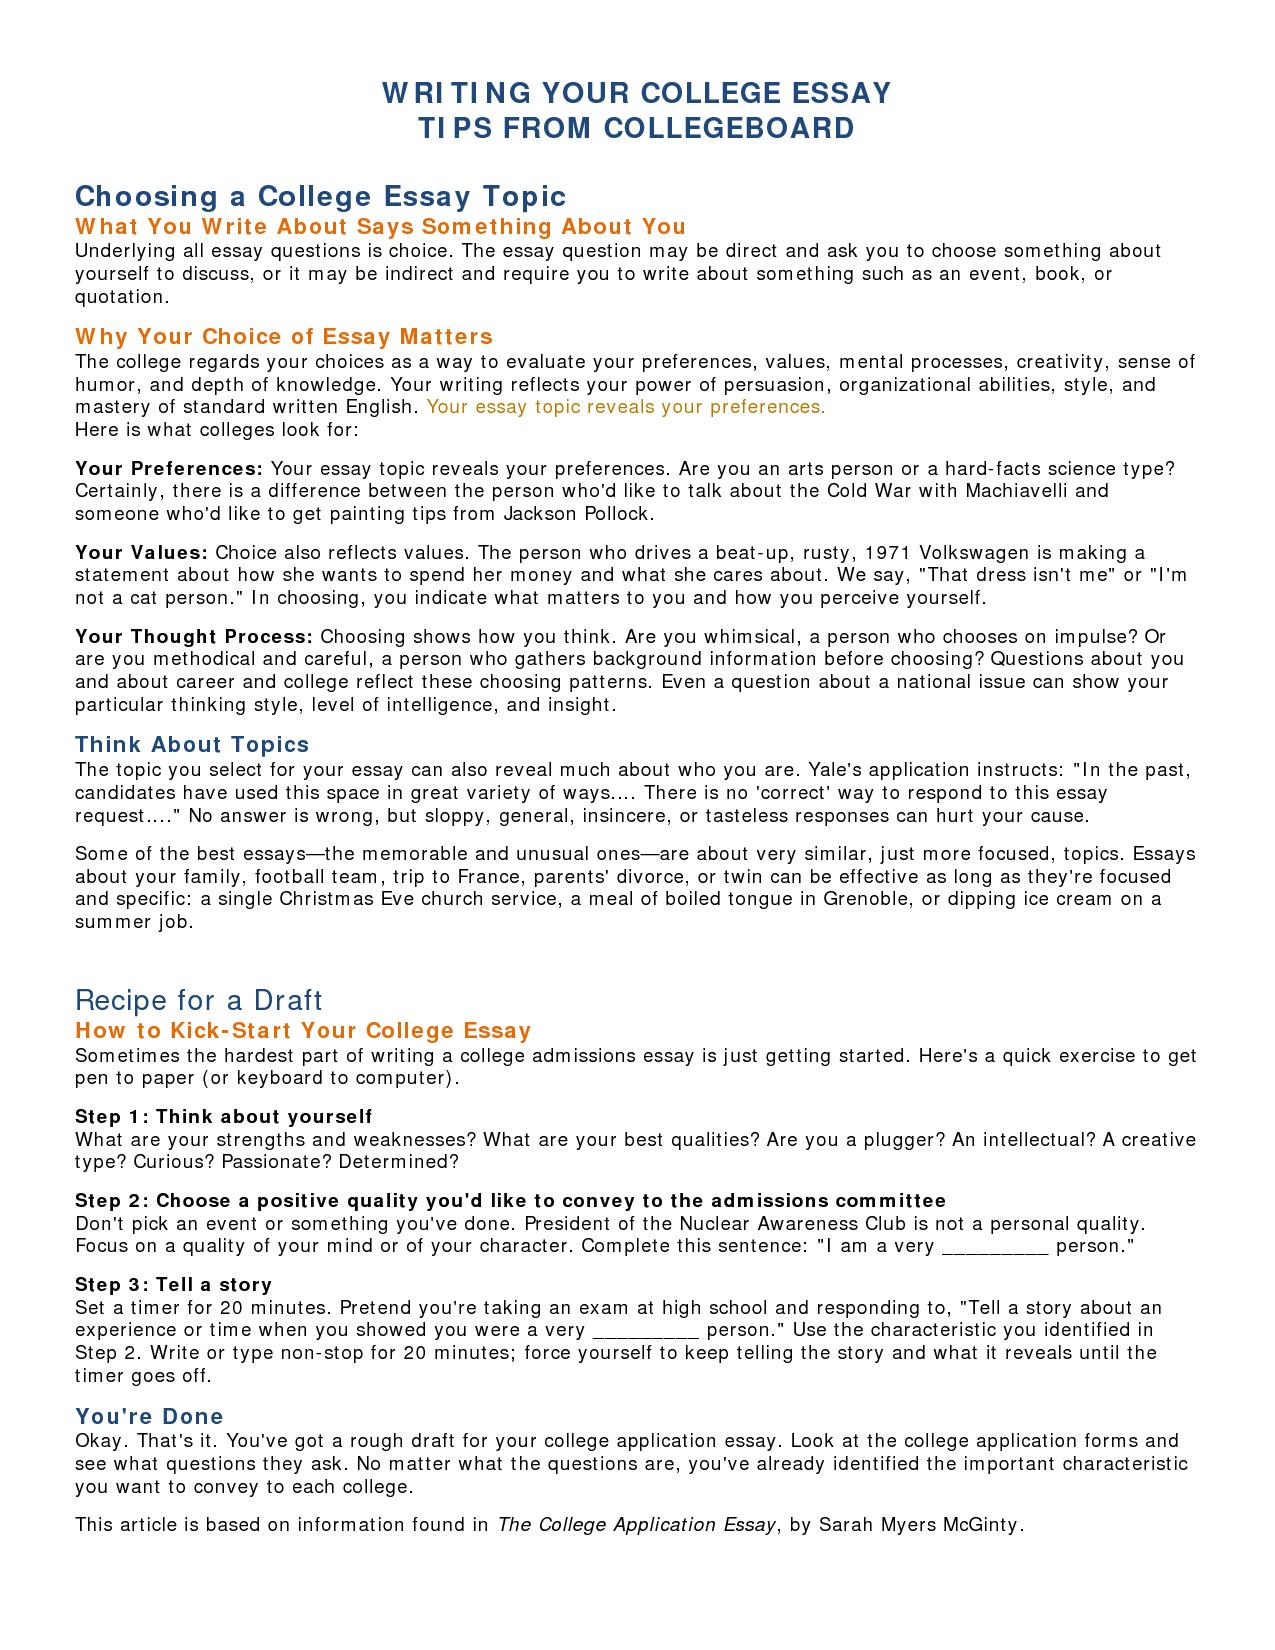 sample college essays httpfoplodge35comcsscollege admission. Resume Example. Resume CV Cover Letter